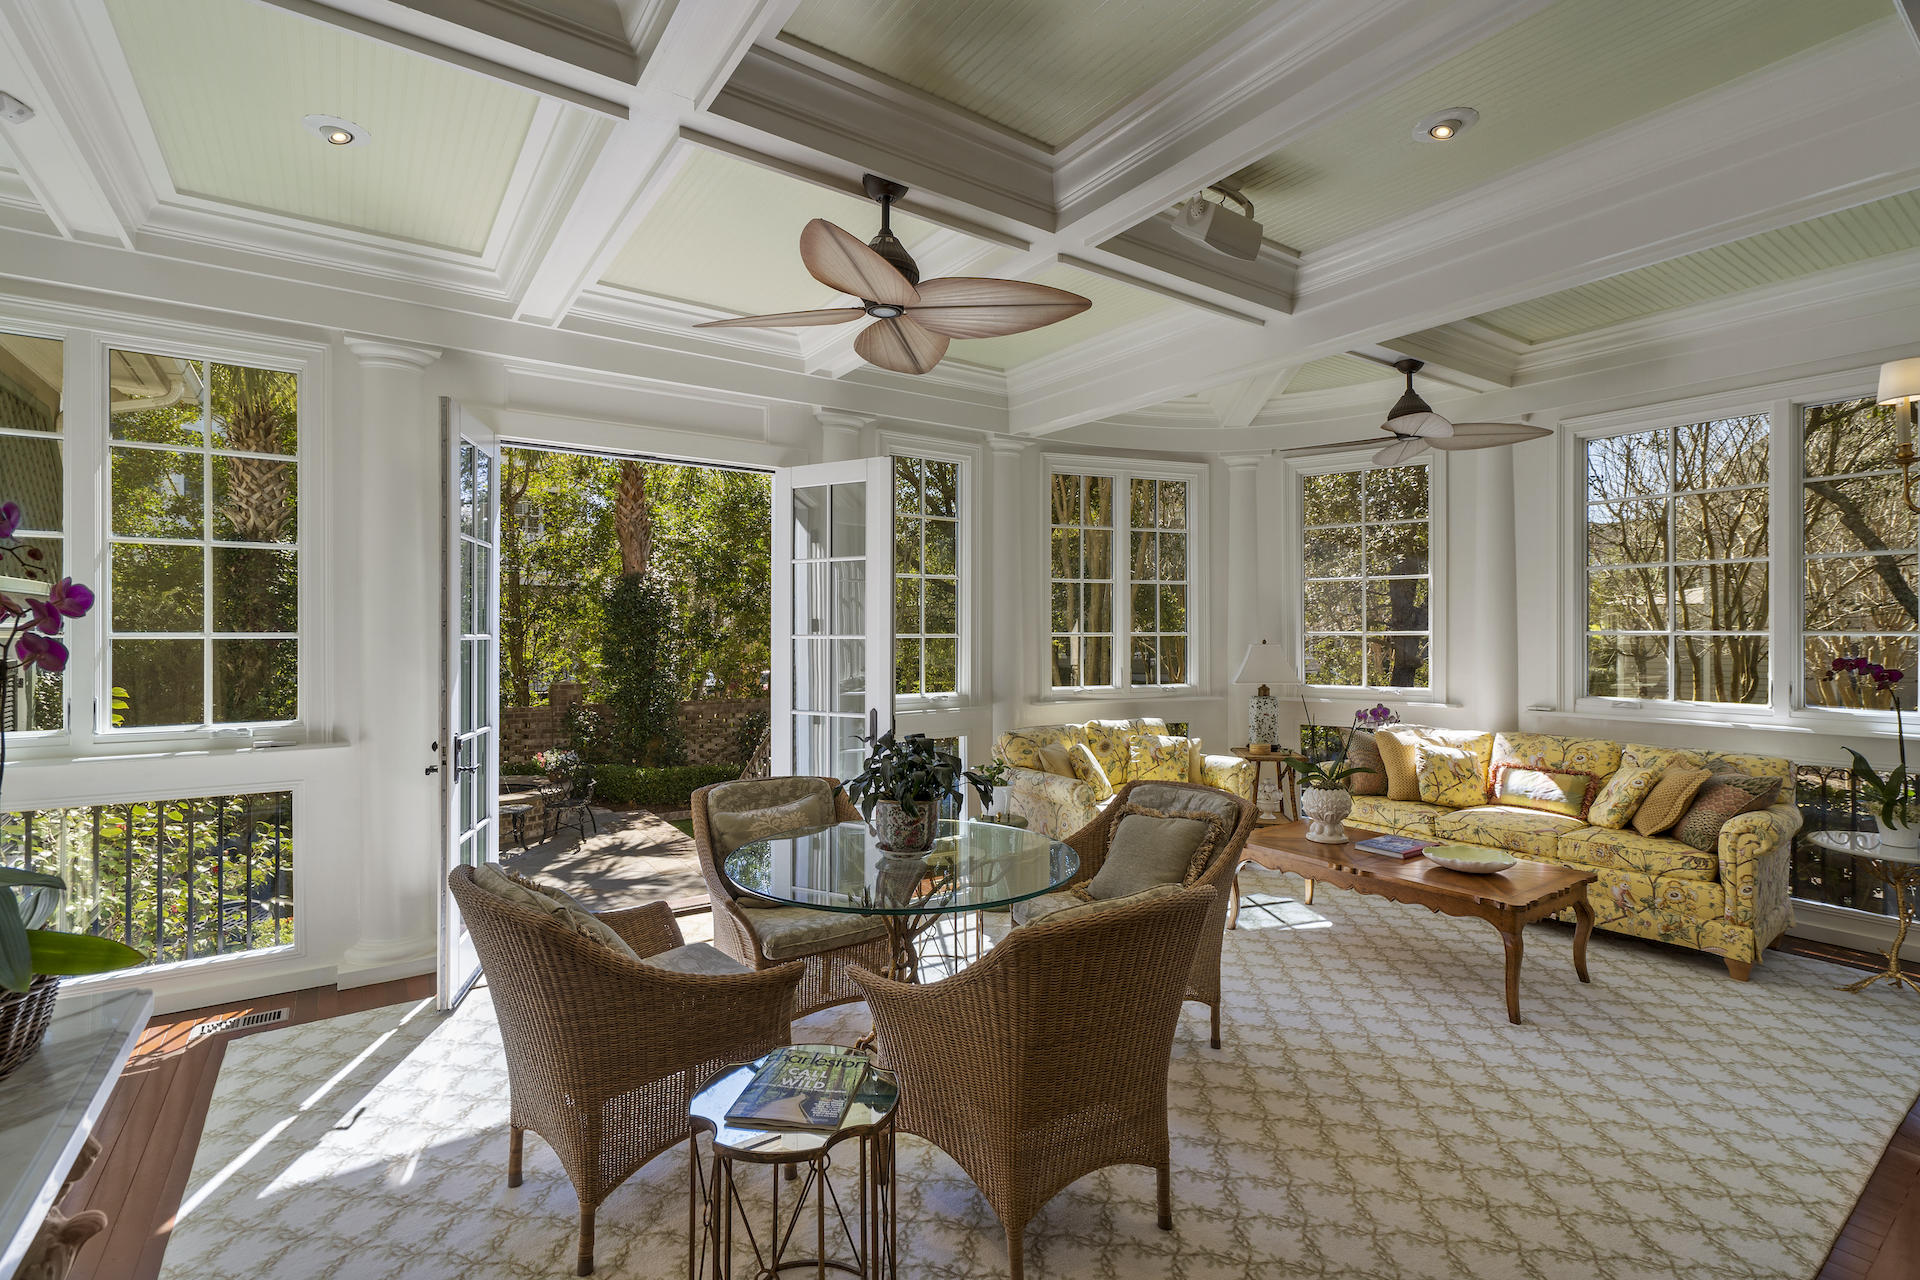 Daniel Island Homes For Sale - 623 Island Park, Charleston, SC - 49